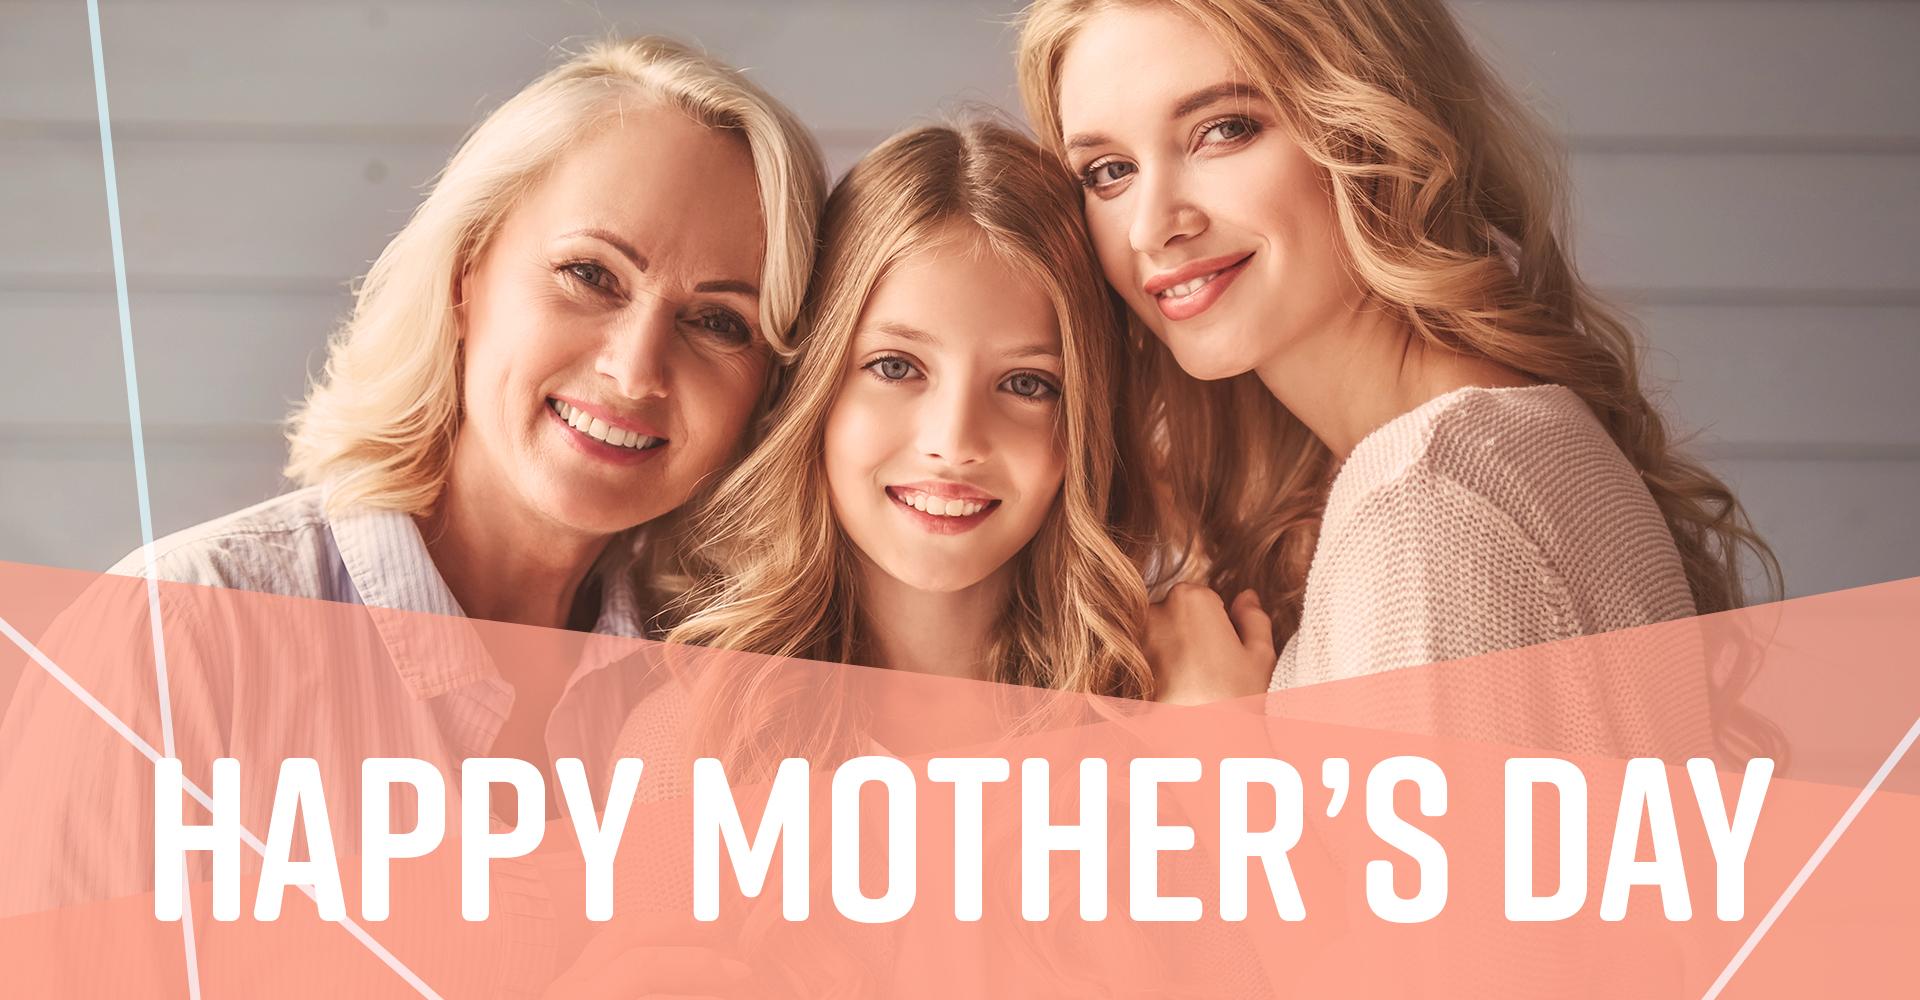 SST_MothersDay_Cover.jpg